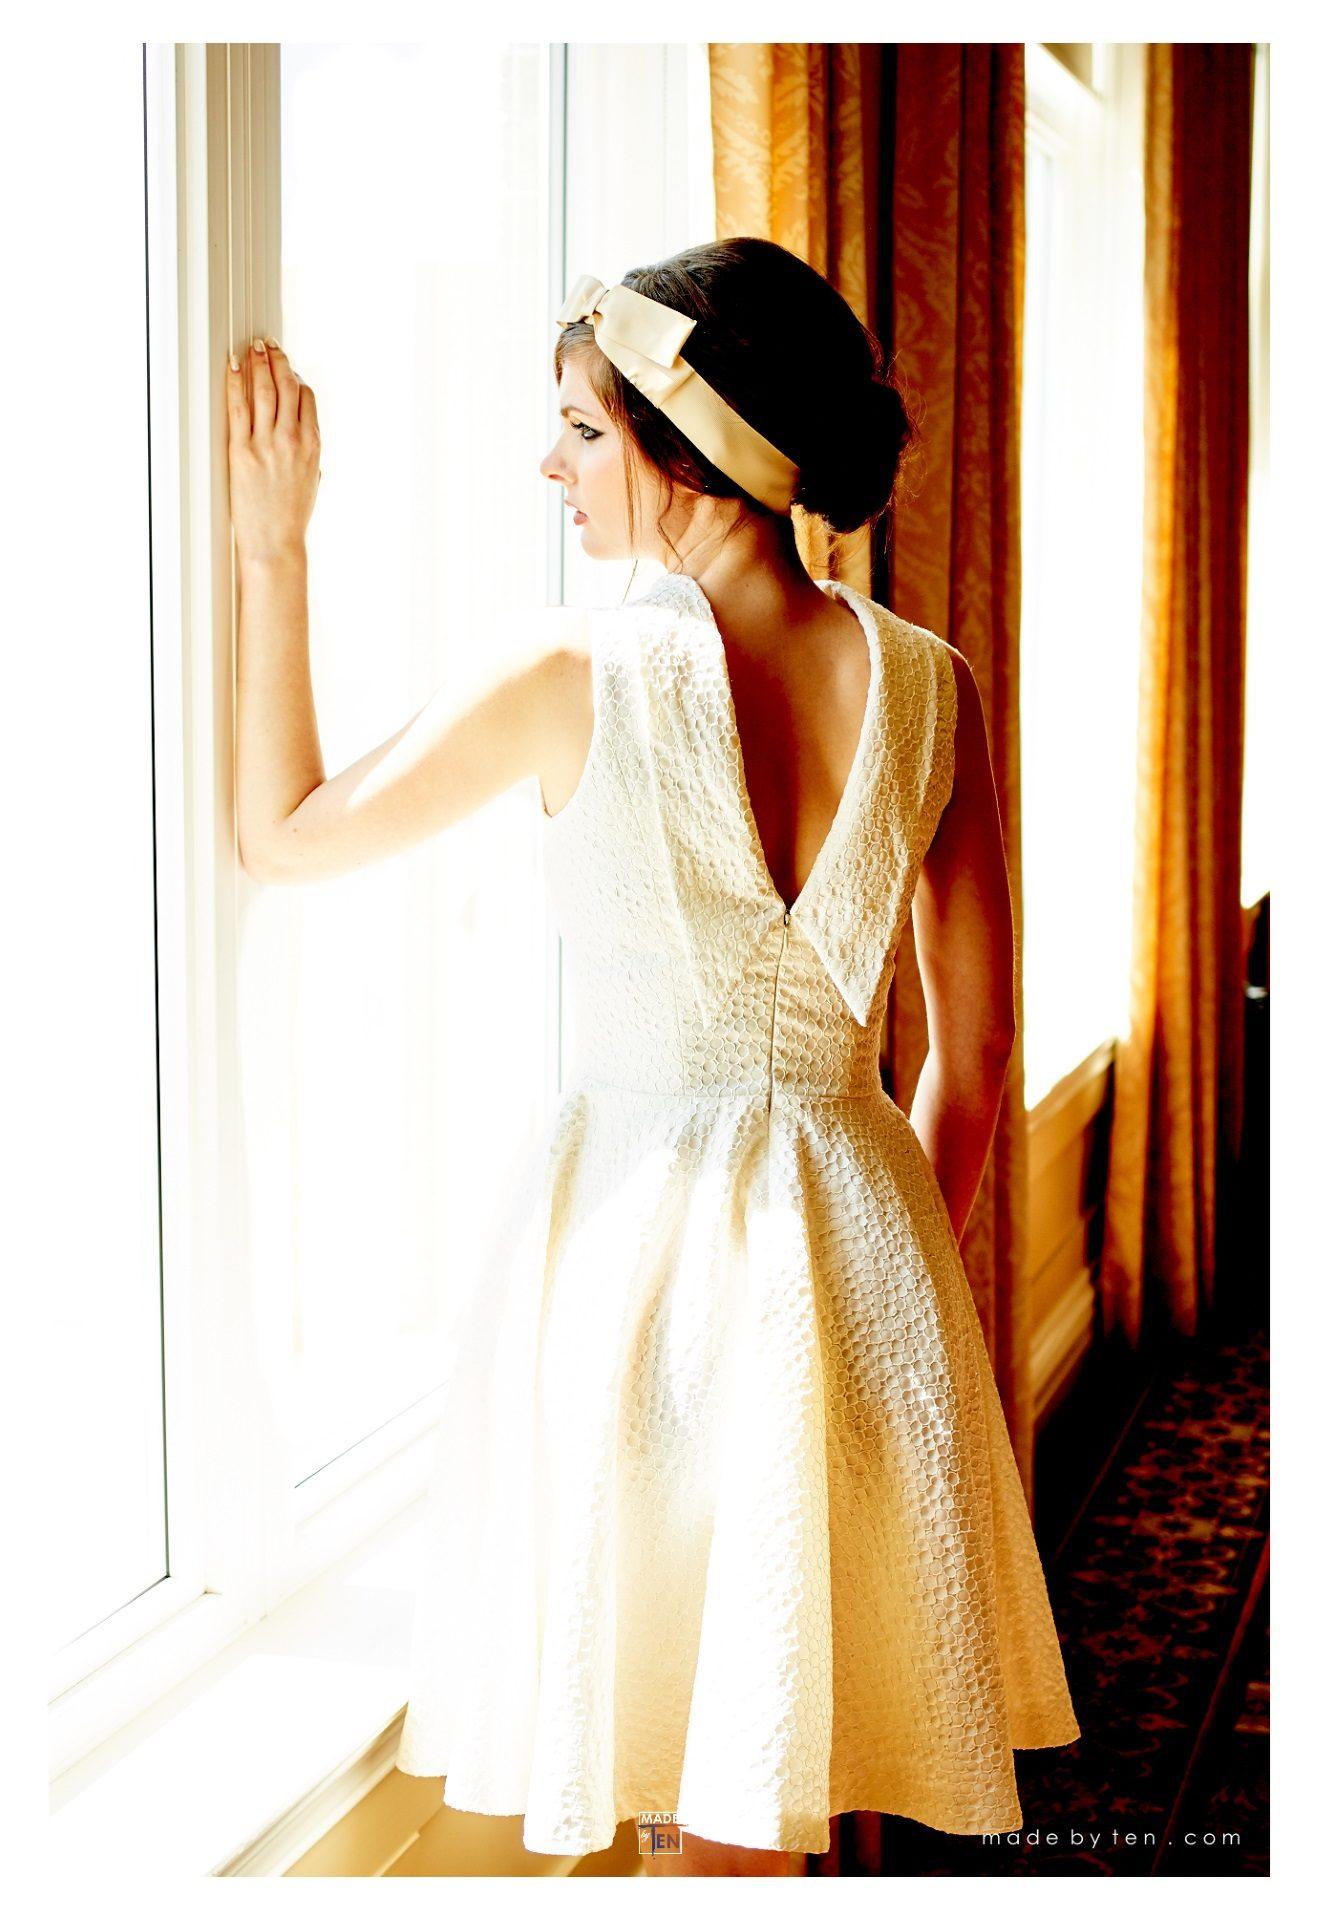 Woman Creative Dress Gold Window Drapes- GTA Women Fashion Photography